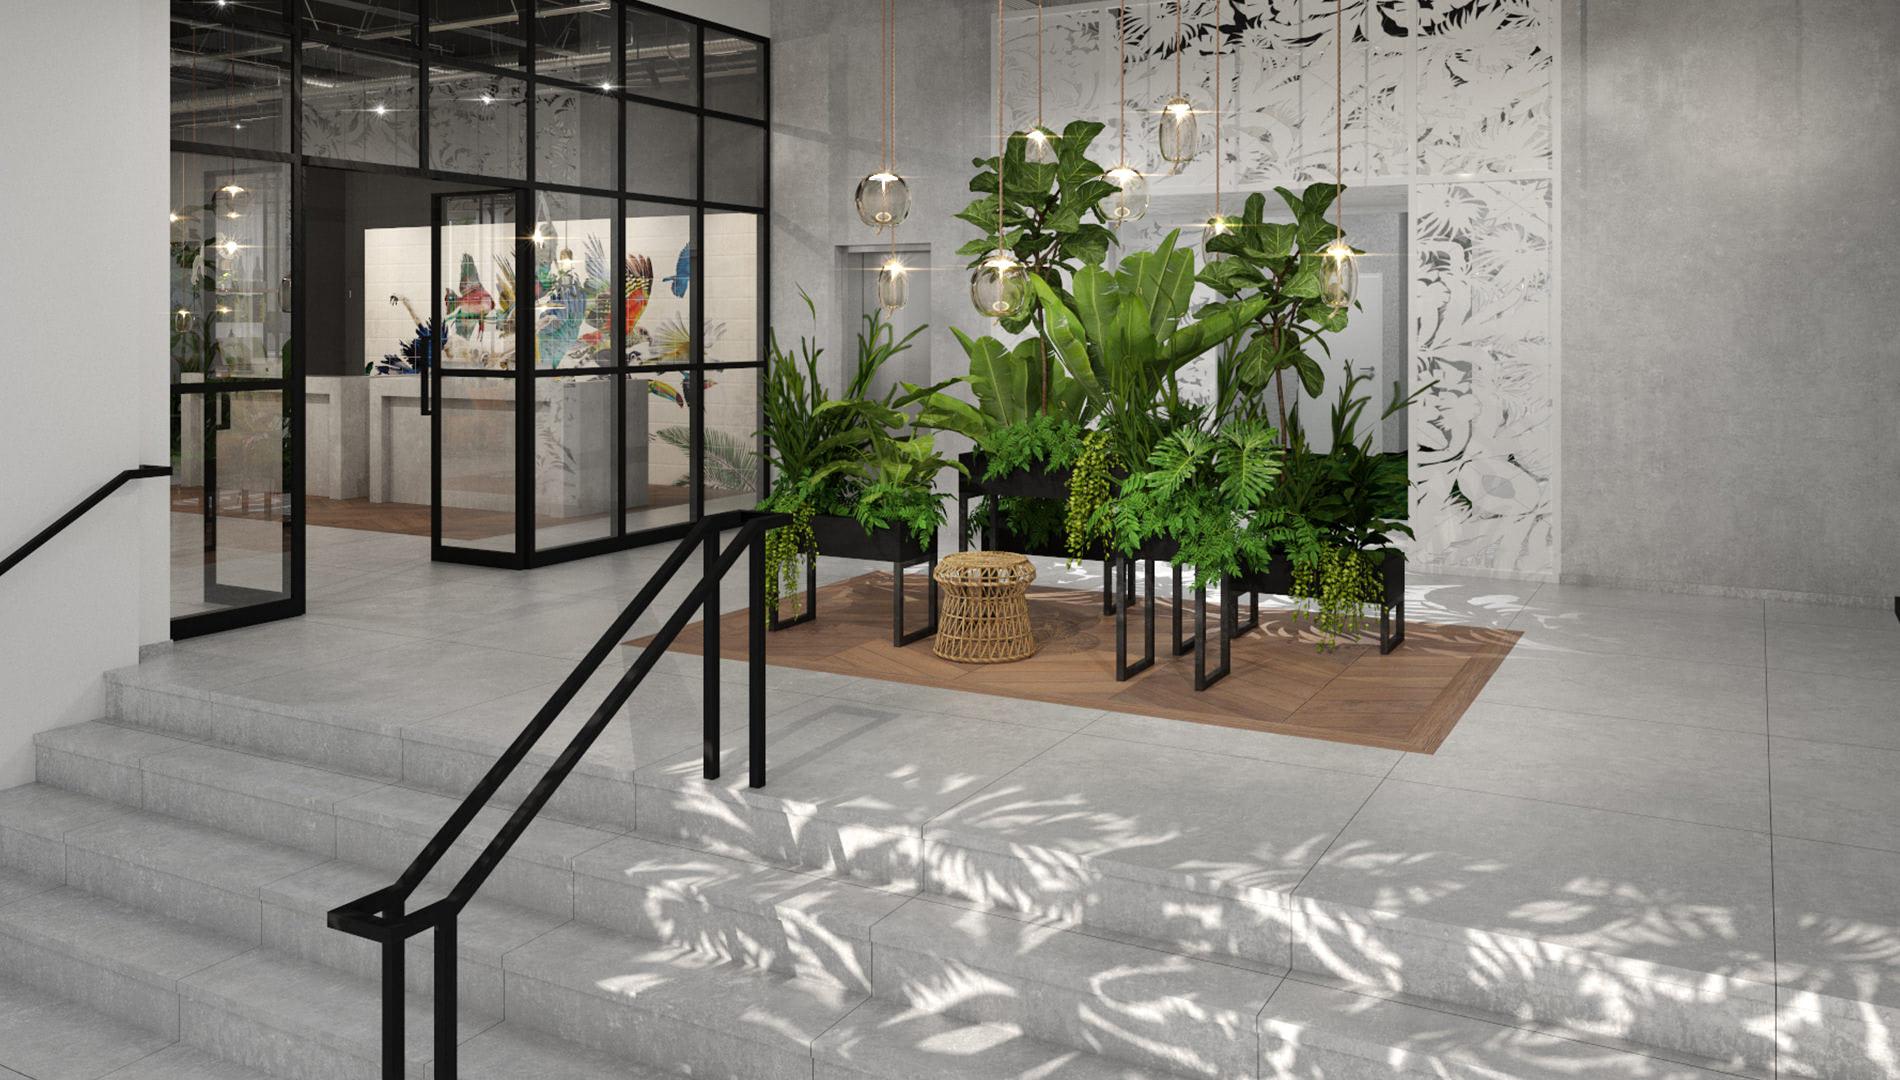 Destinationsentwicklung Ninety Nine Hotels Wuppertal Hotel Design Foyer Rezeption Going Places